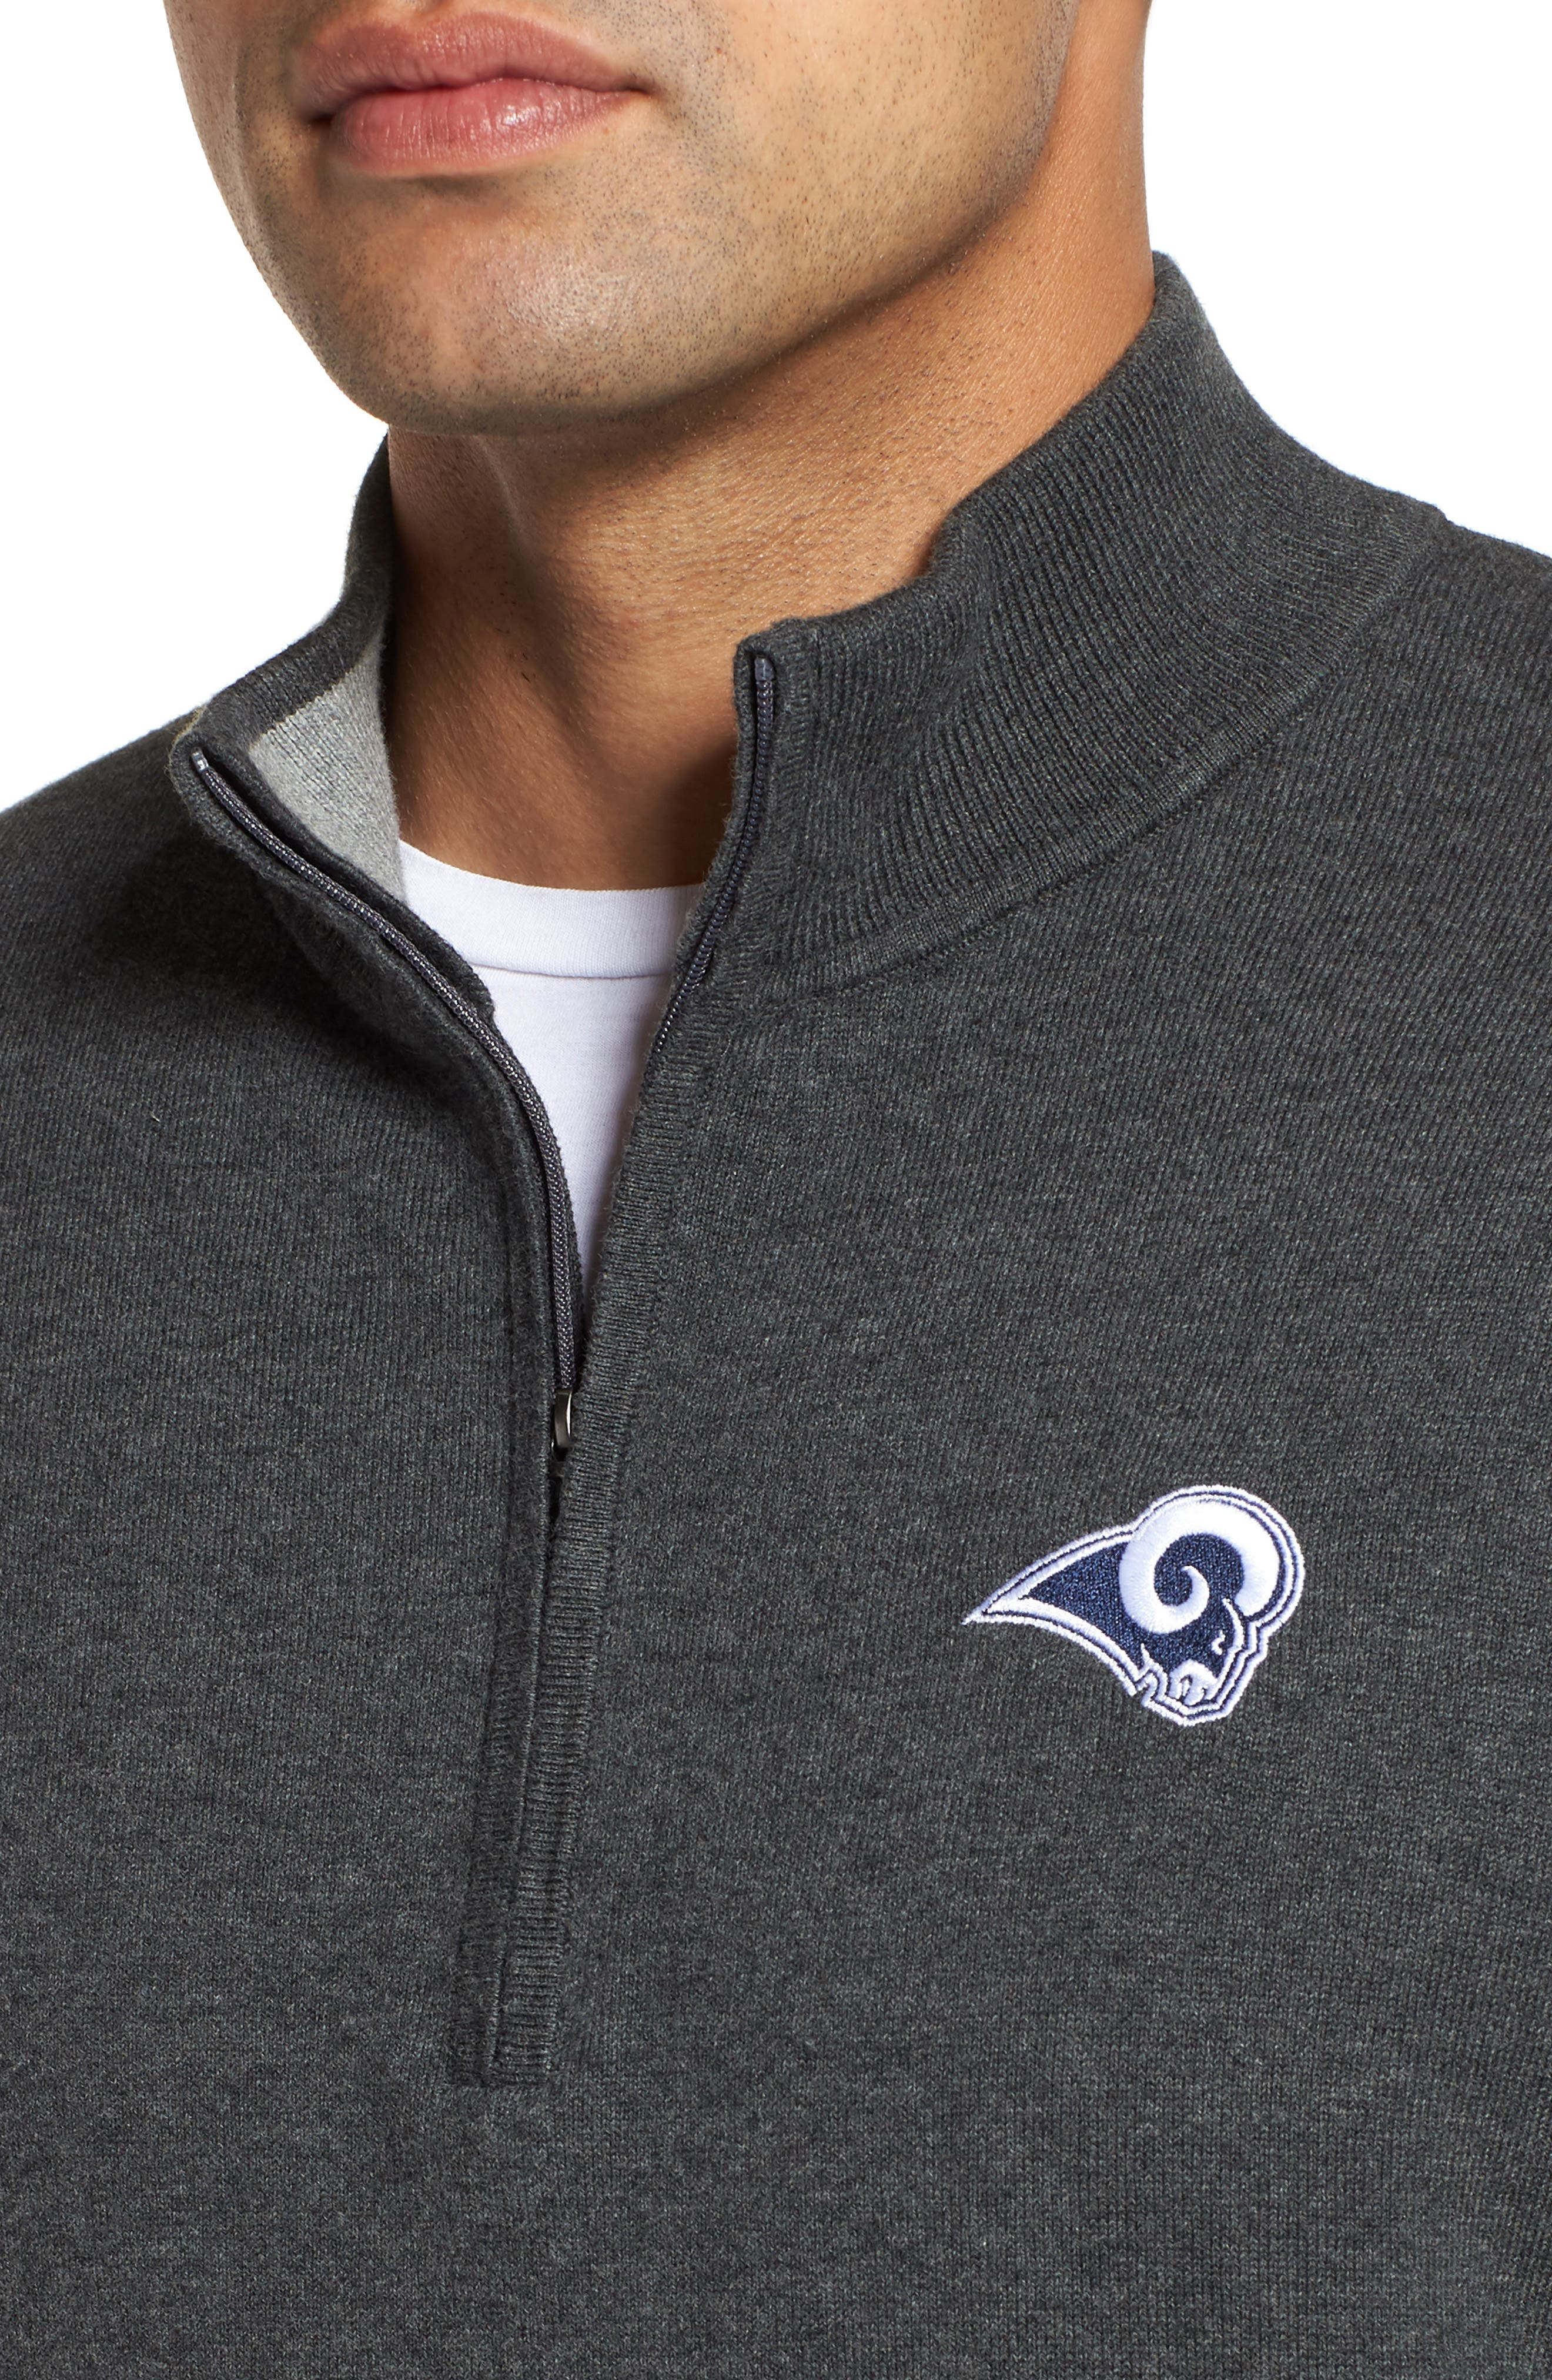 Los Angeles Rams - Lakemont Regular Fit Quarter Zip Sweater,                             Alternate thumbnail 4, color,                             CHARCOAL HEATHER